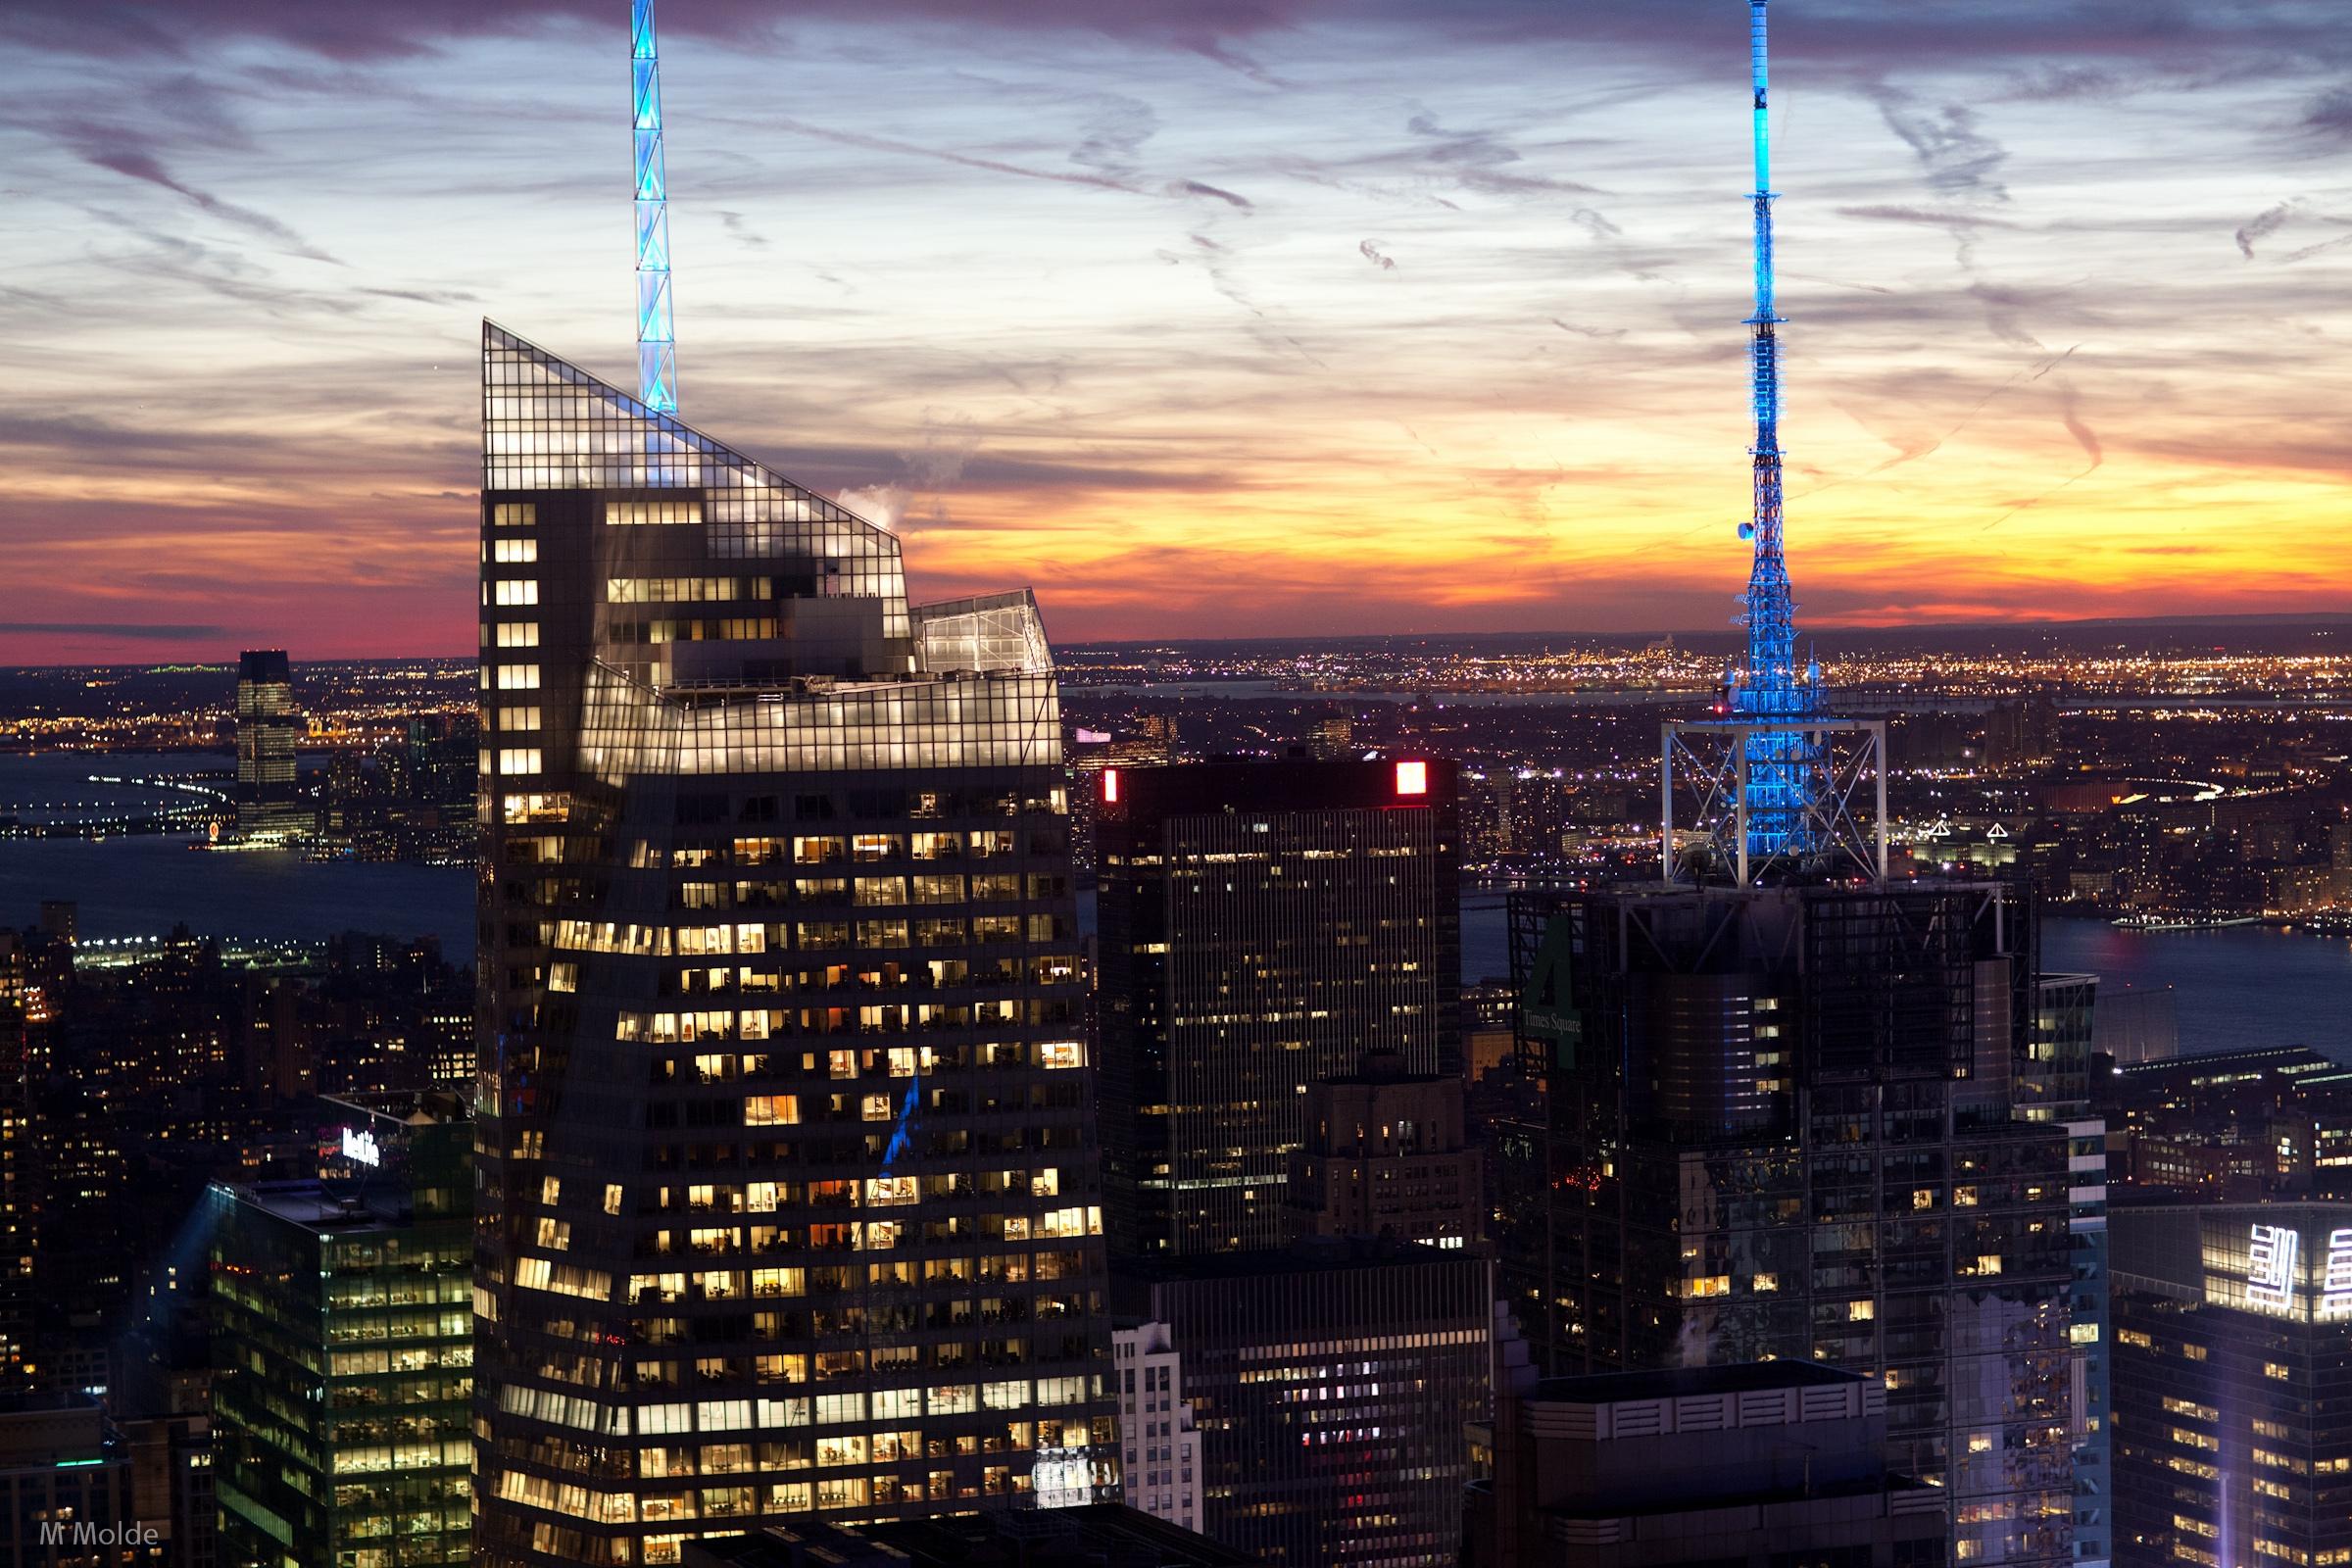 Download wallpaper 2400x1600 city new york manhattan usa bank 2400x1600